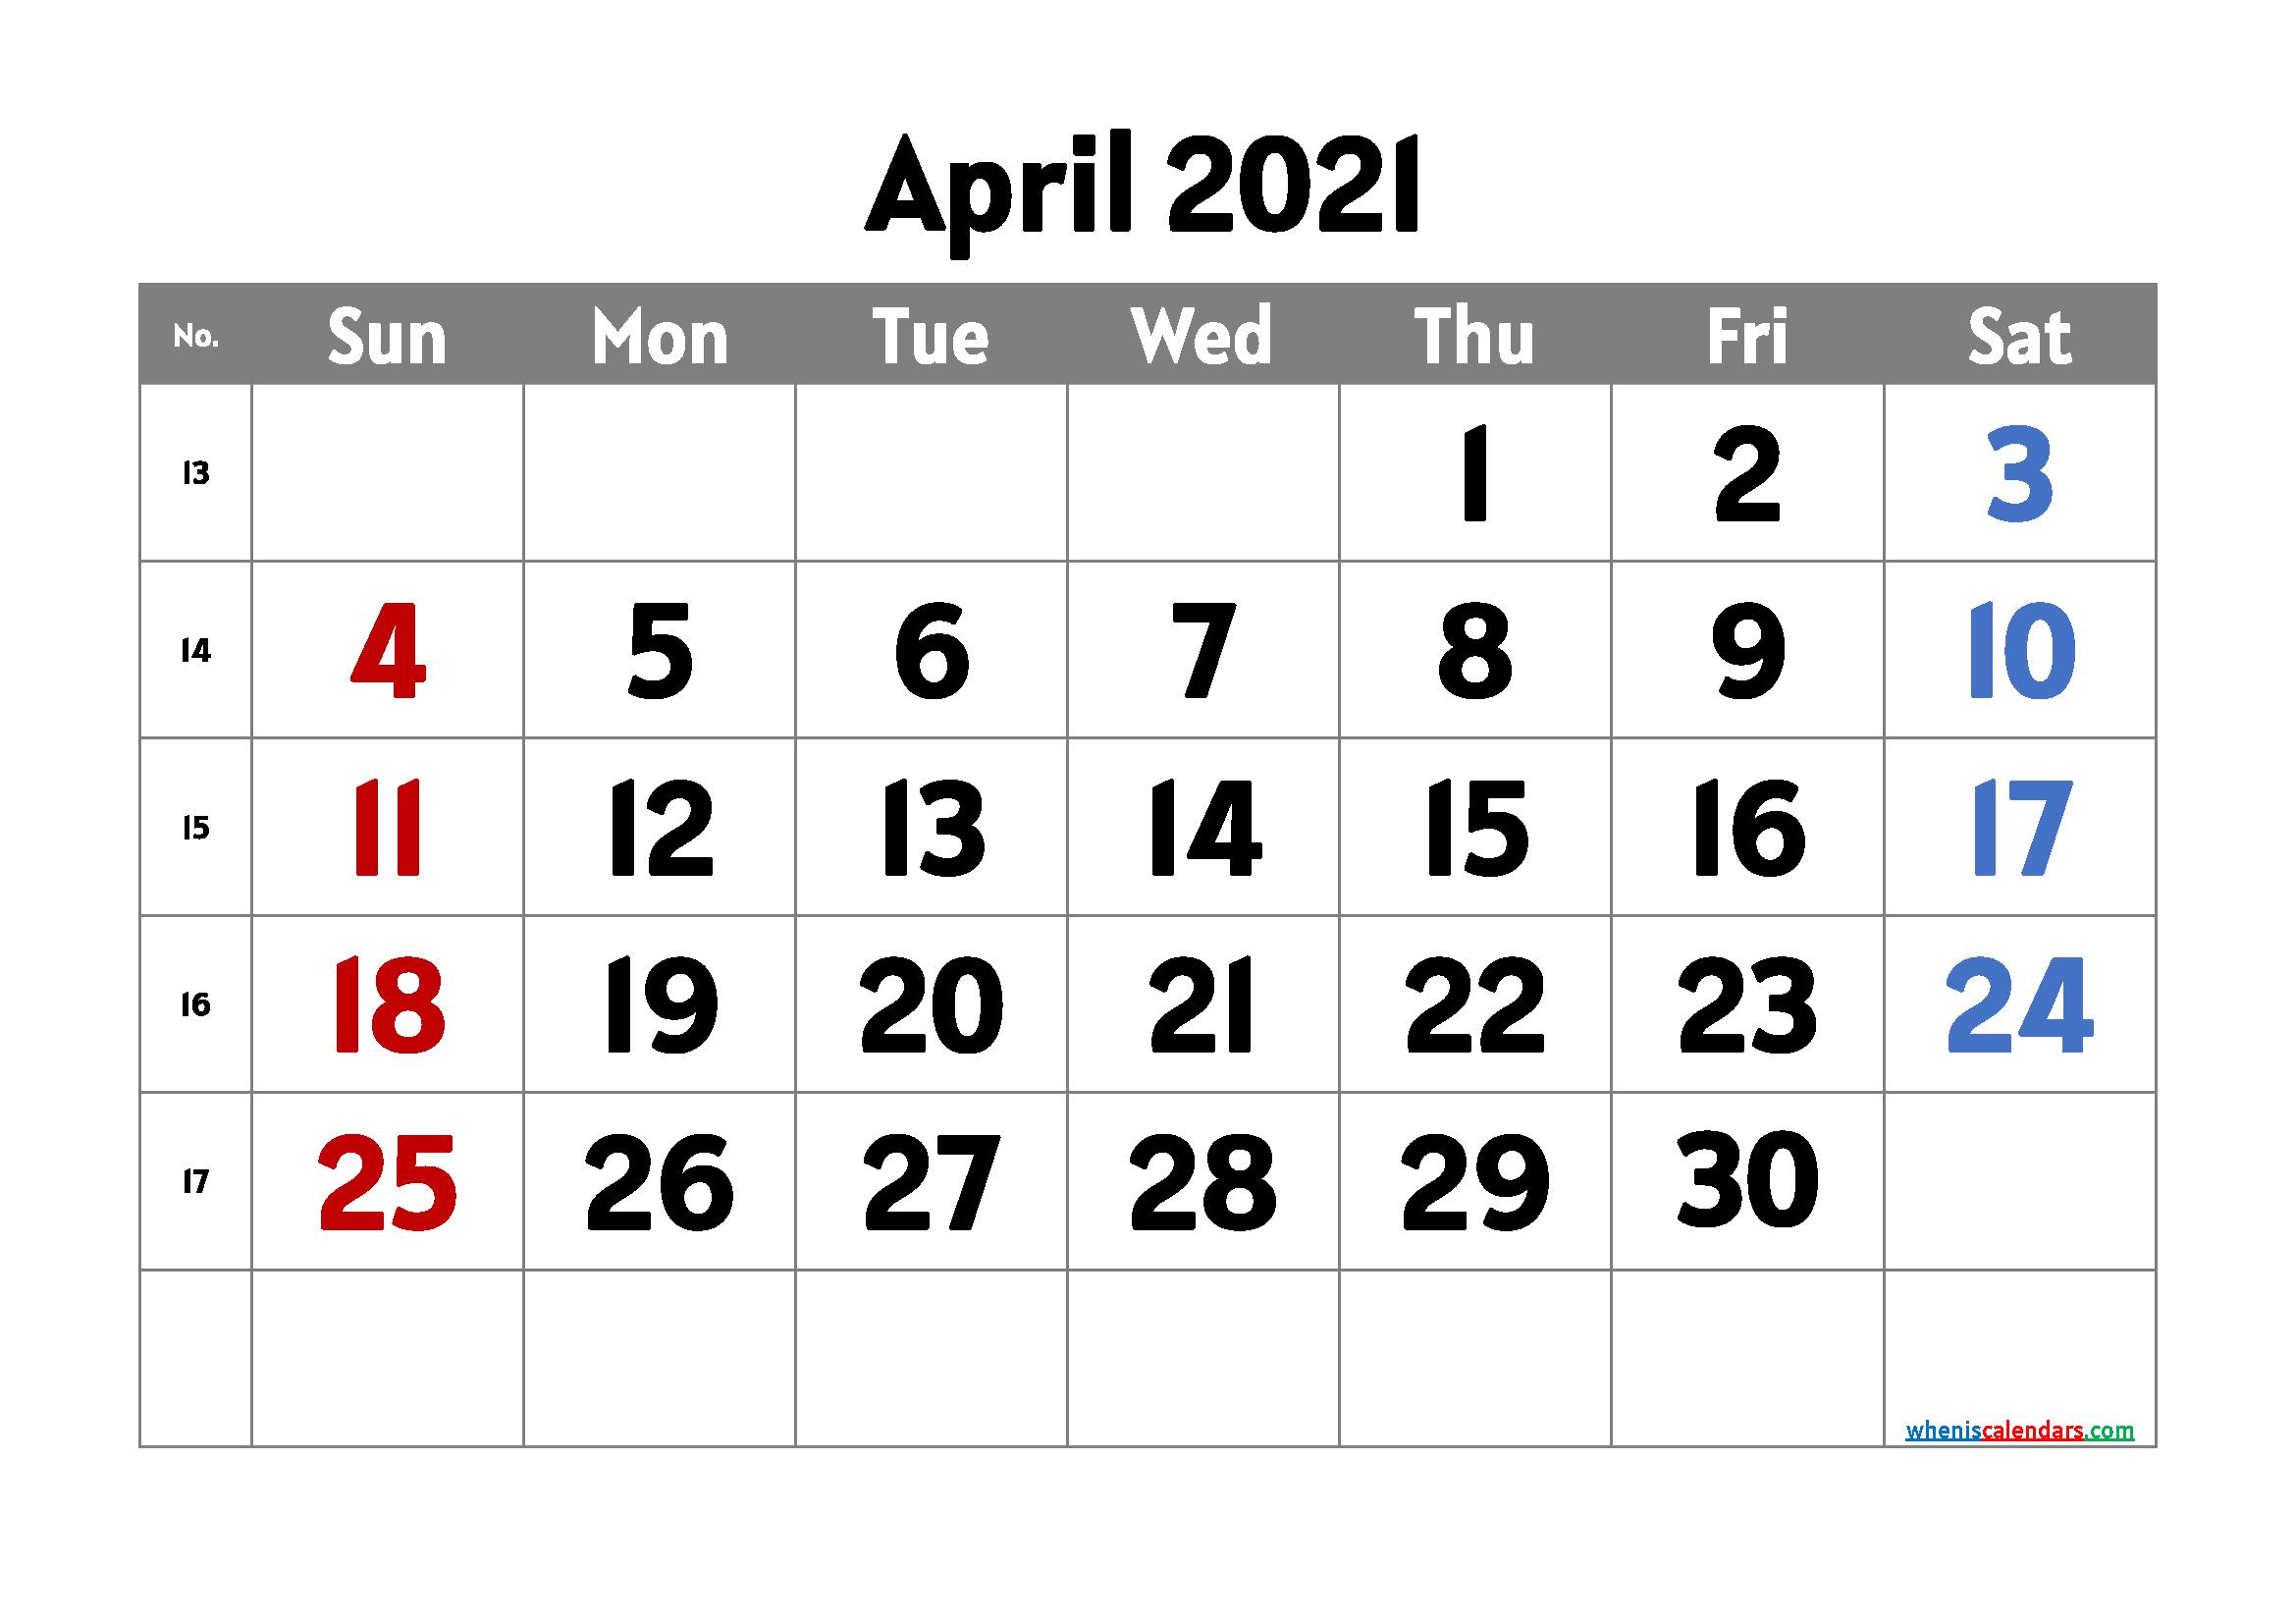 April 2021 Calendar Printable Free